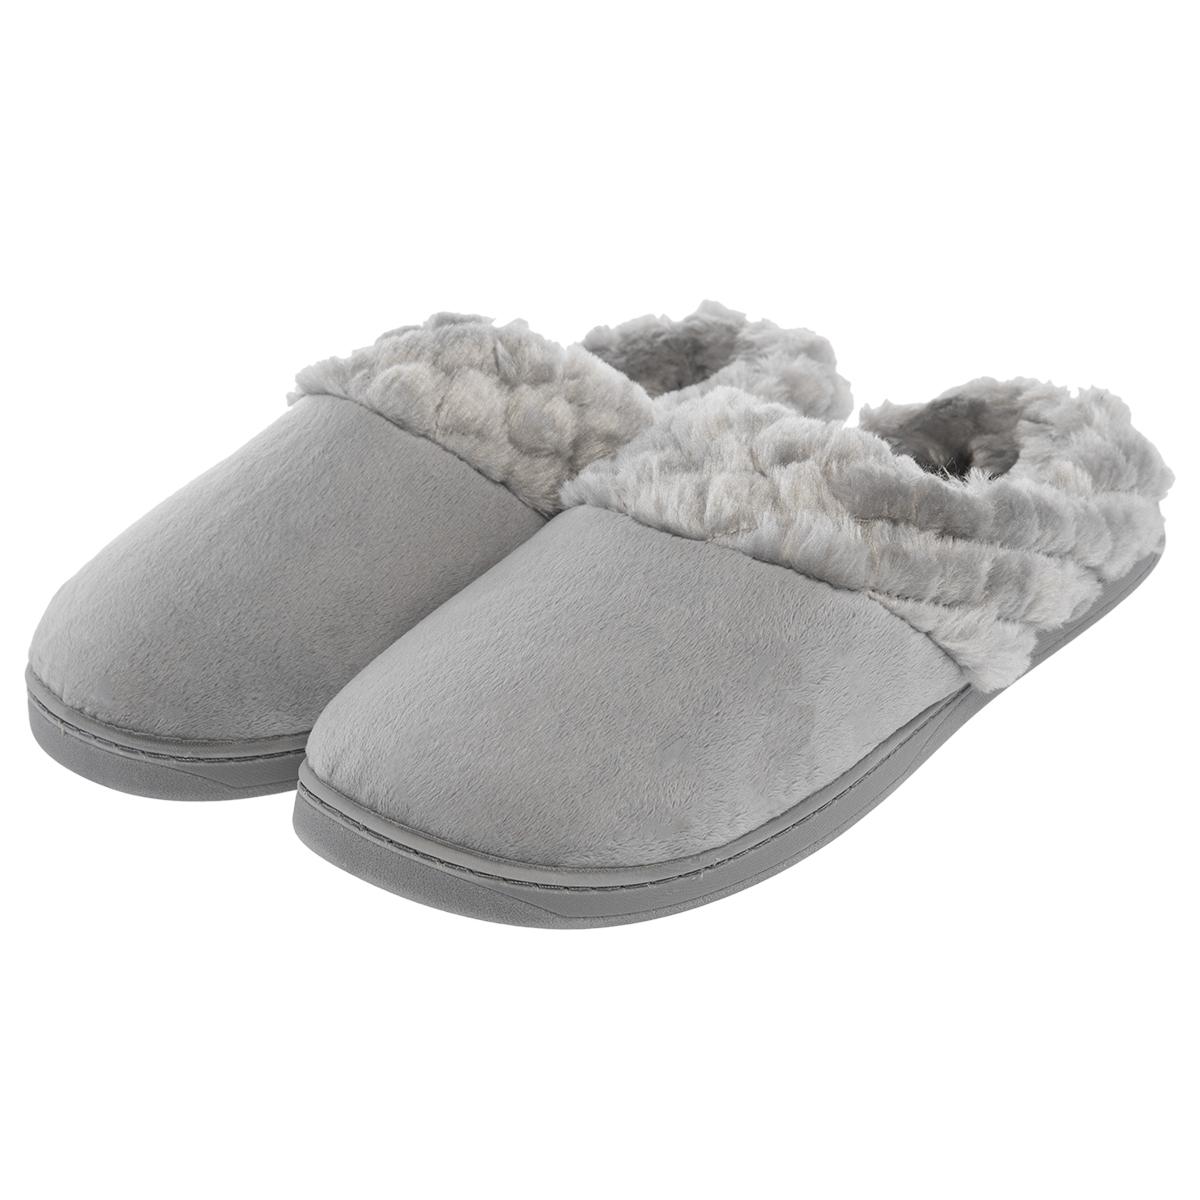 Aerosoles Women S Cushioned House Slippers Mule Clogs Warm